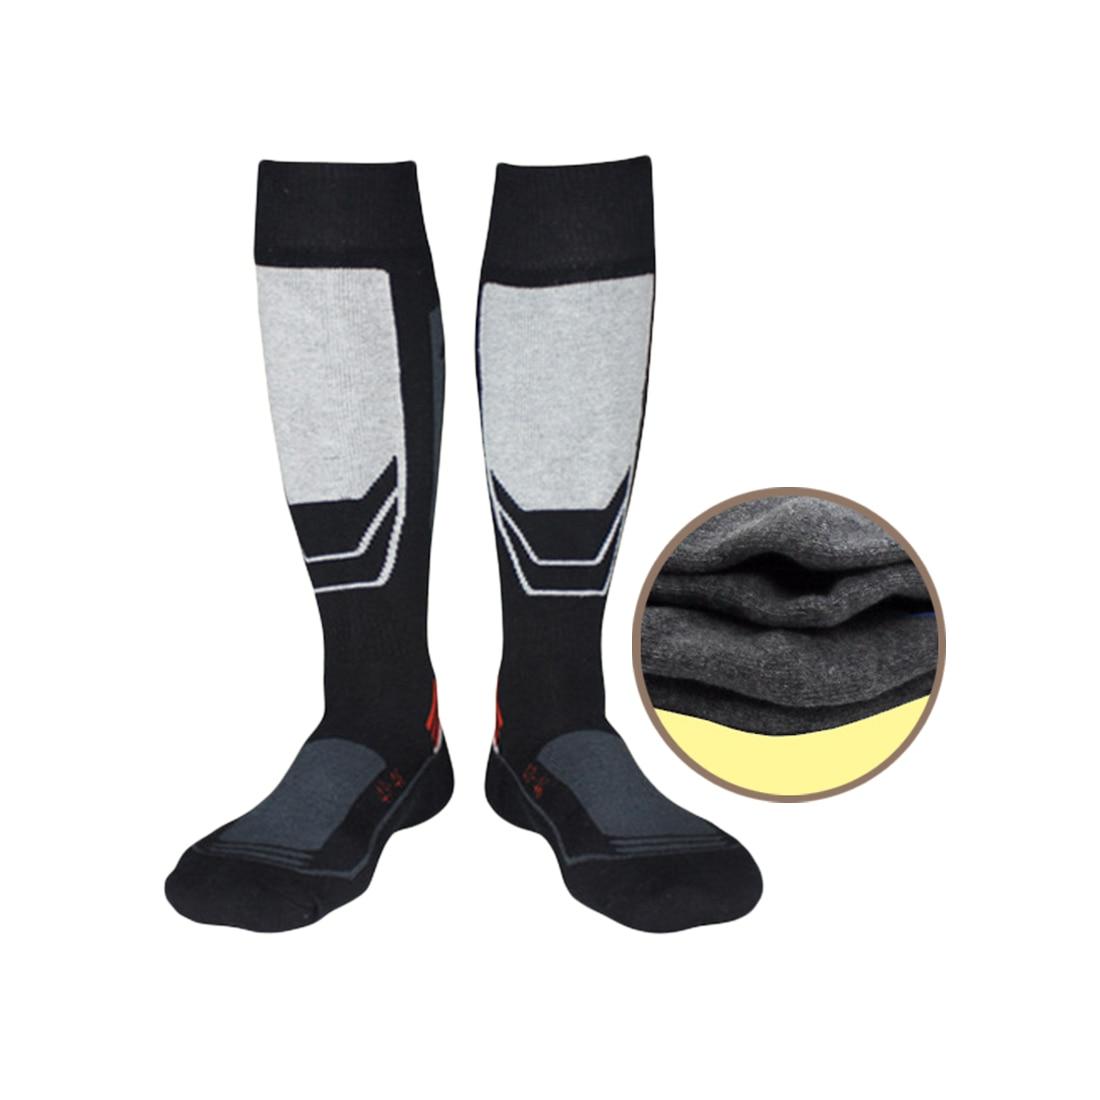 Warm Men Thermal Ski Socks Thick Cotton Sports Snowboard Cycling Skiing Soccer Socks Thermosocks Leg Warmers calcetas ciclismo